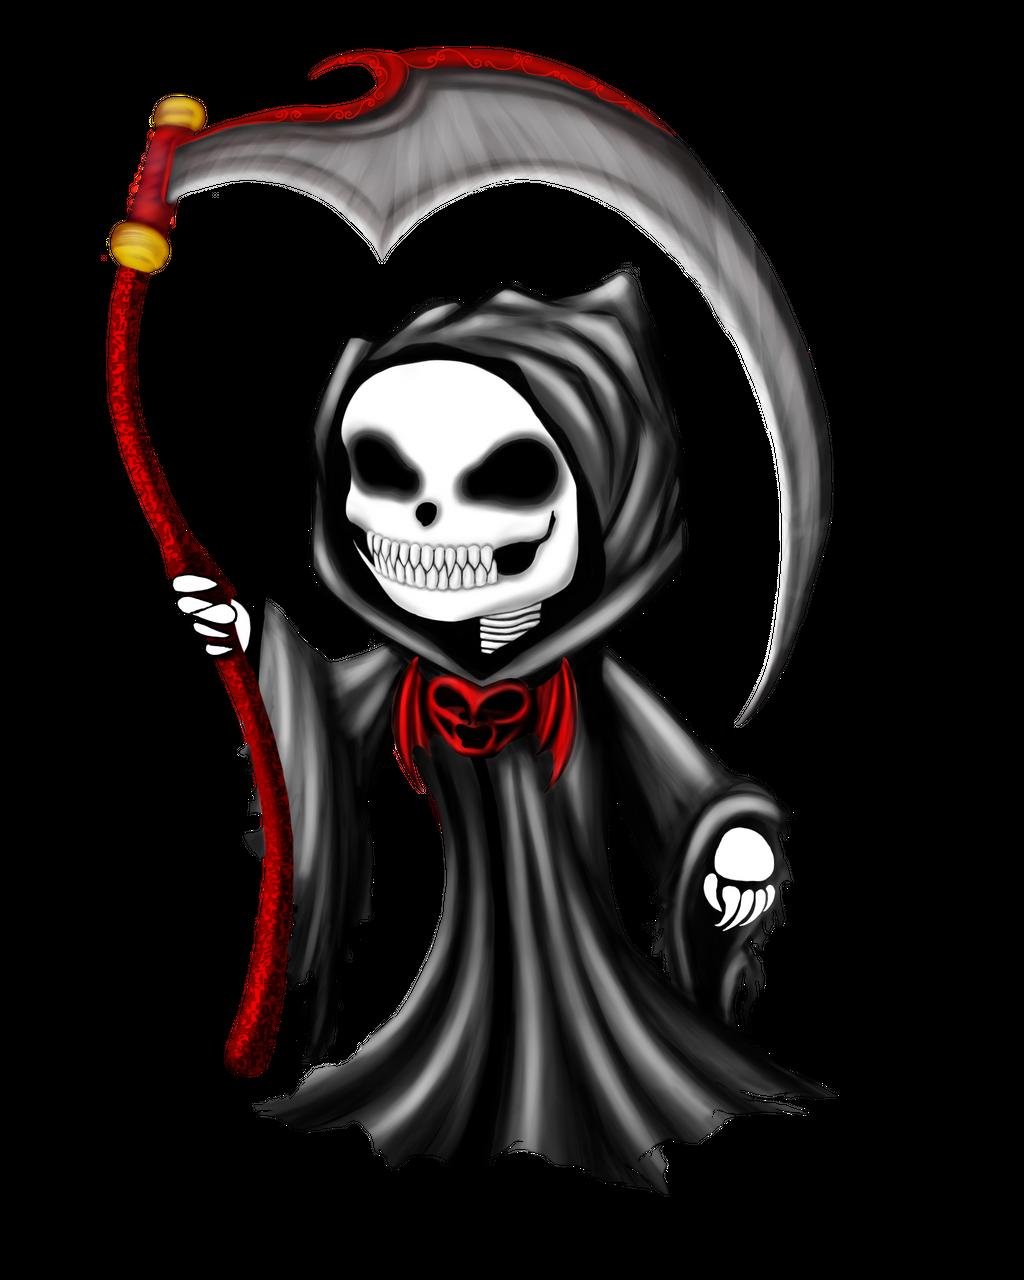 Chibi Grim Reaper By Tarasf On Deviantart Grim Reaper Tattoo Grim Reaper Drawing Reaper Drawing